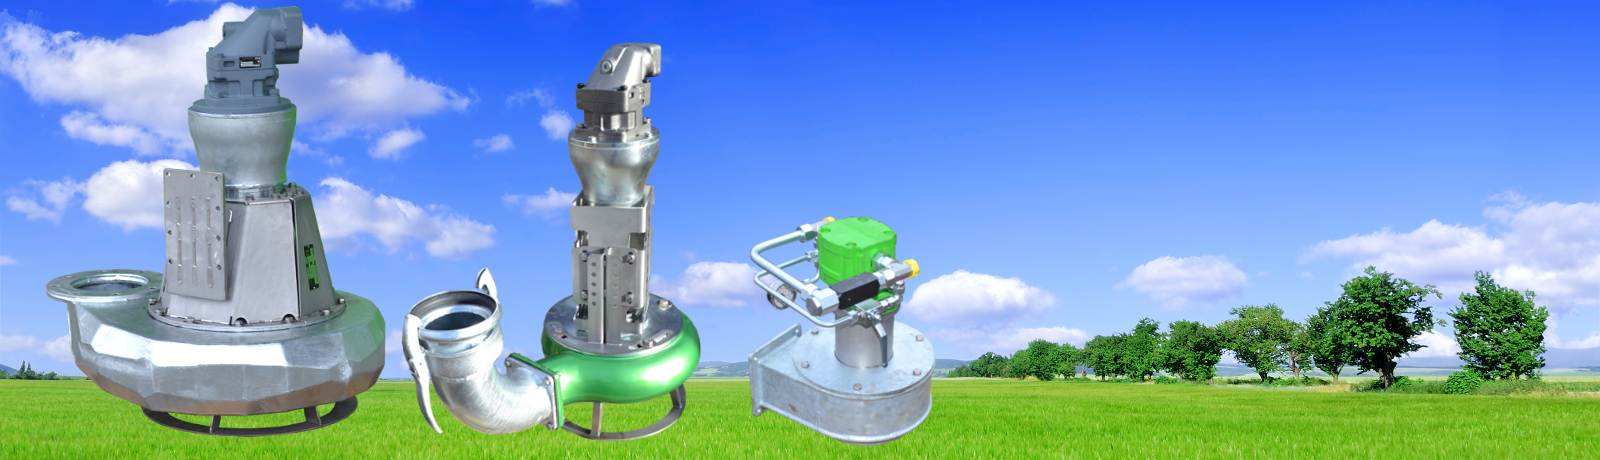 Baggerpumpen Euro-P Pumpen mit Hydromotor